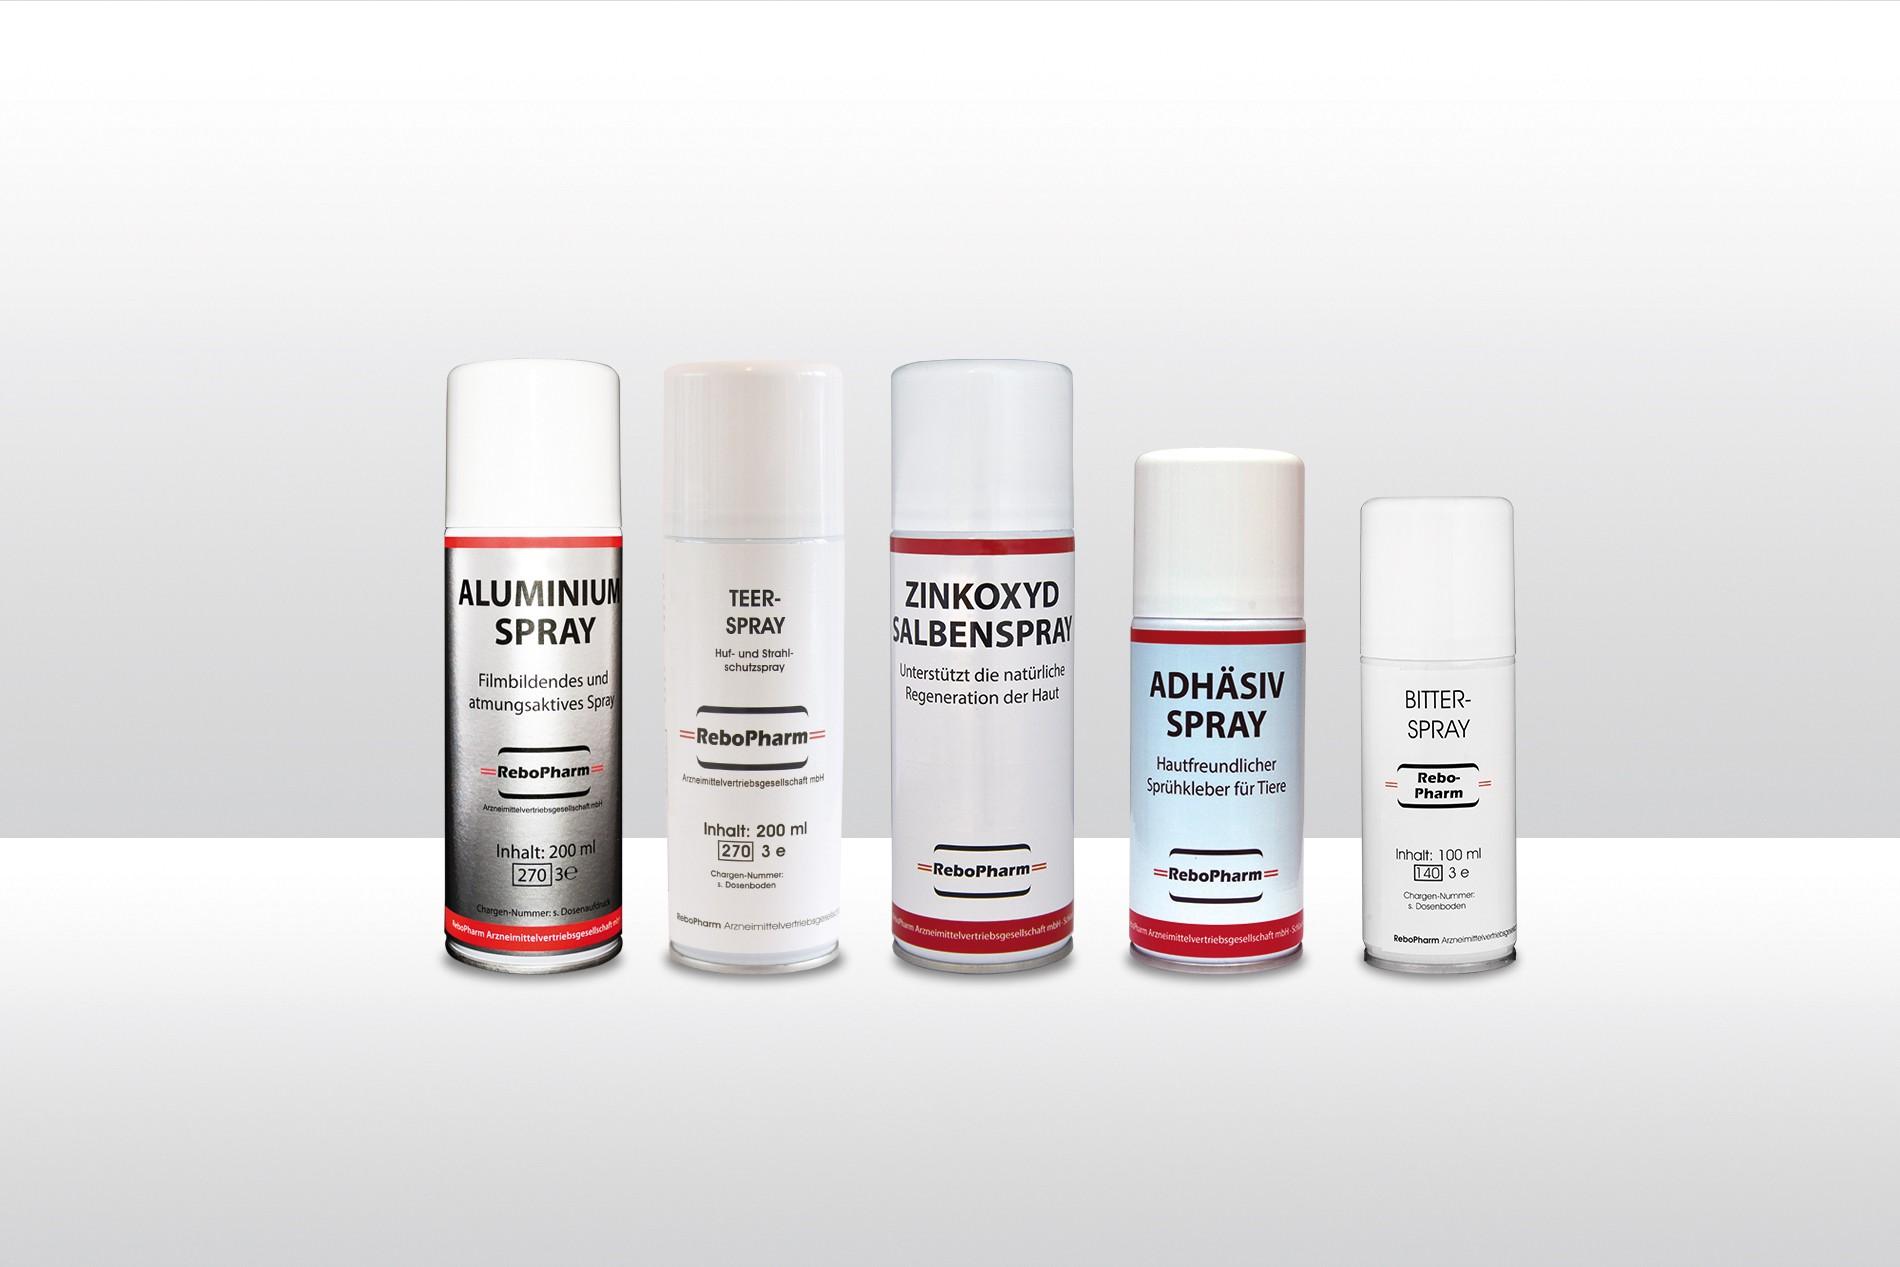 ReboPharm Sprays